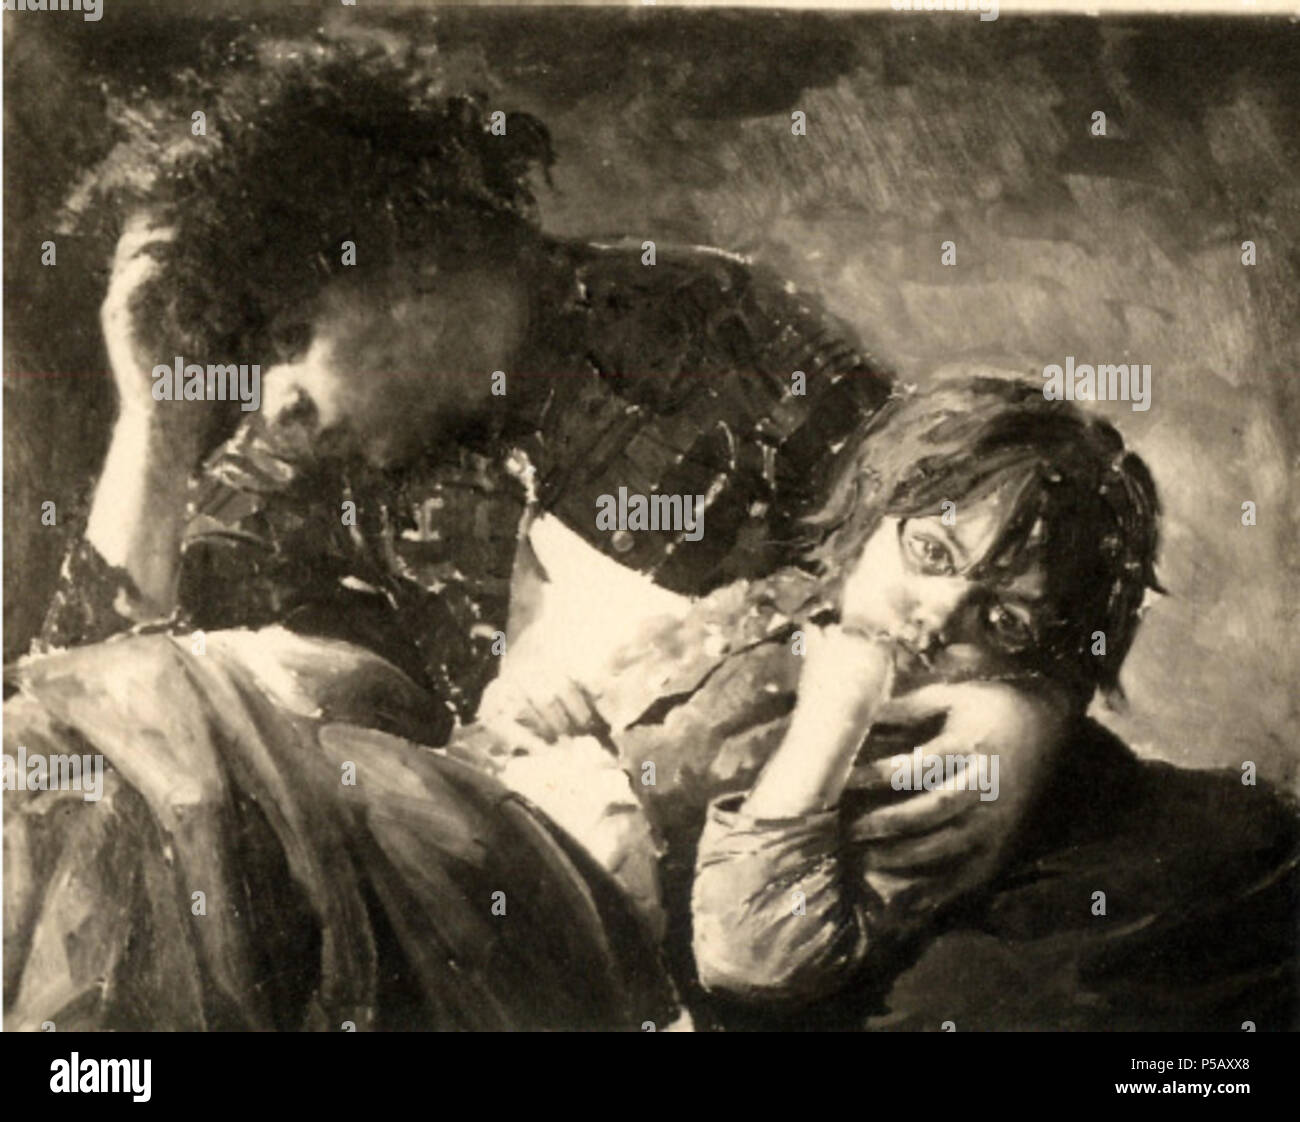 N/A. Per via . circa 1885.    Antonino Gandolfo (1841–1910)   Description Italian painter  Date of birth/death 28 October 1841 / 28 November 1841 21 March 1910  Location of birth/death Catania Catania  Authority control  : Q599226 VIAF:192926748 ISNI:0000 0003 8530 7345 SUDOC:118598074 RKD:333730 Koninklijke:157849333 112 Antonino gandolfo per via - Stock Image